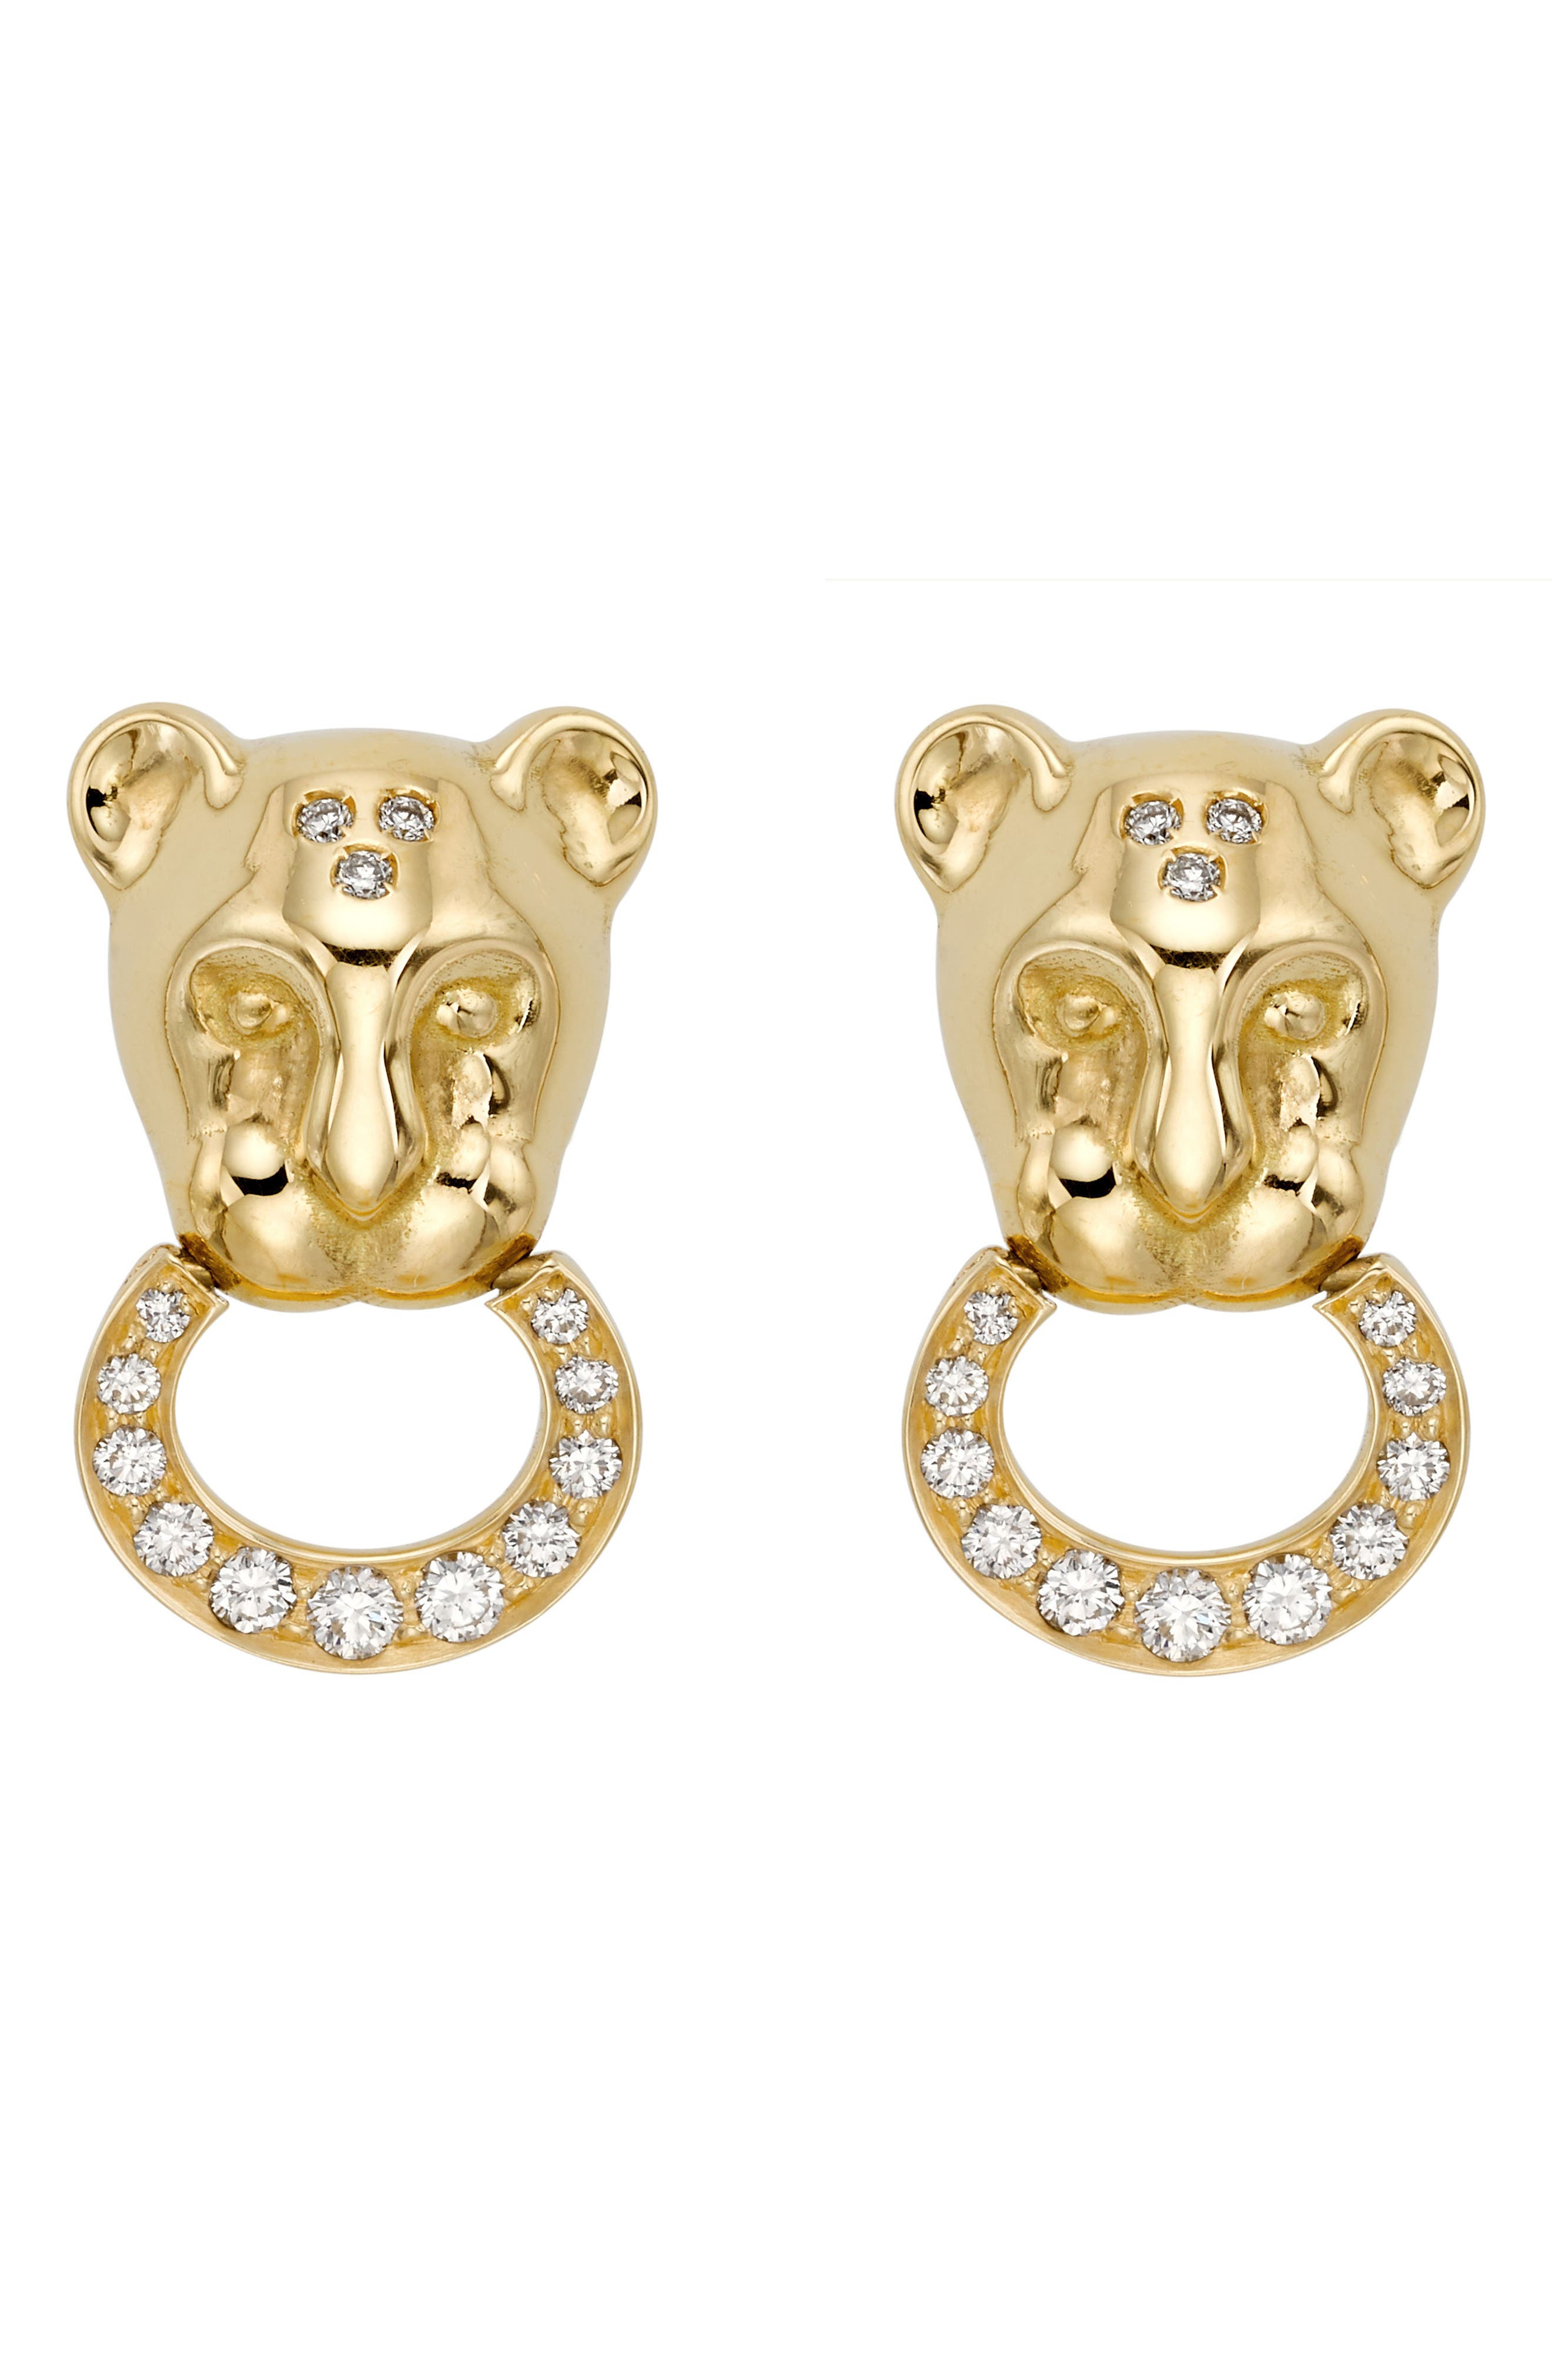 Main Image - Temple St. Clair Lion Cub Diamond Stud Earrings